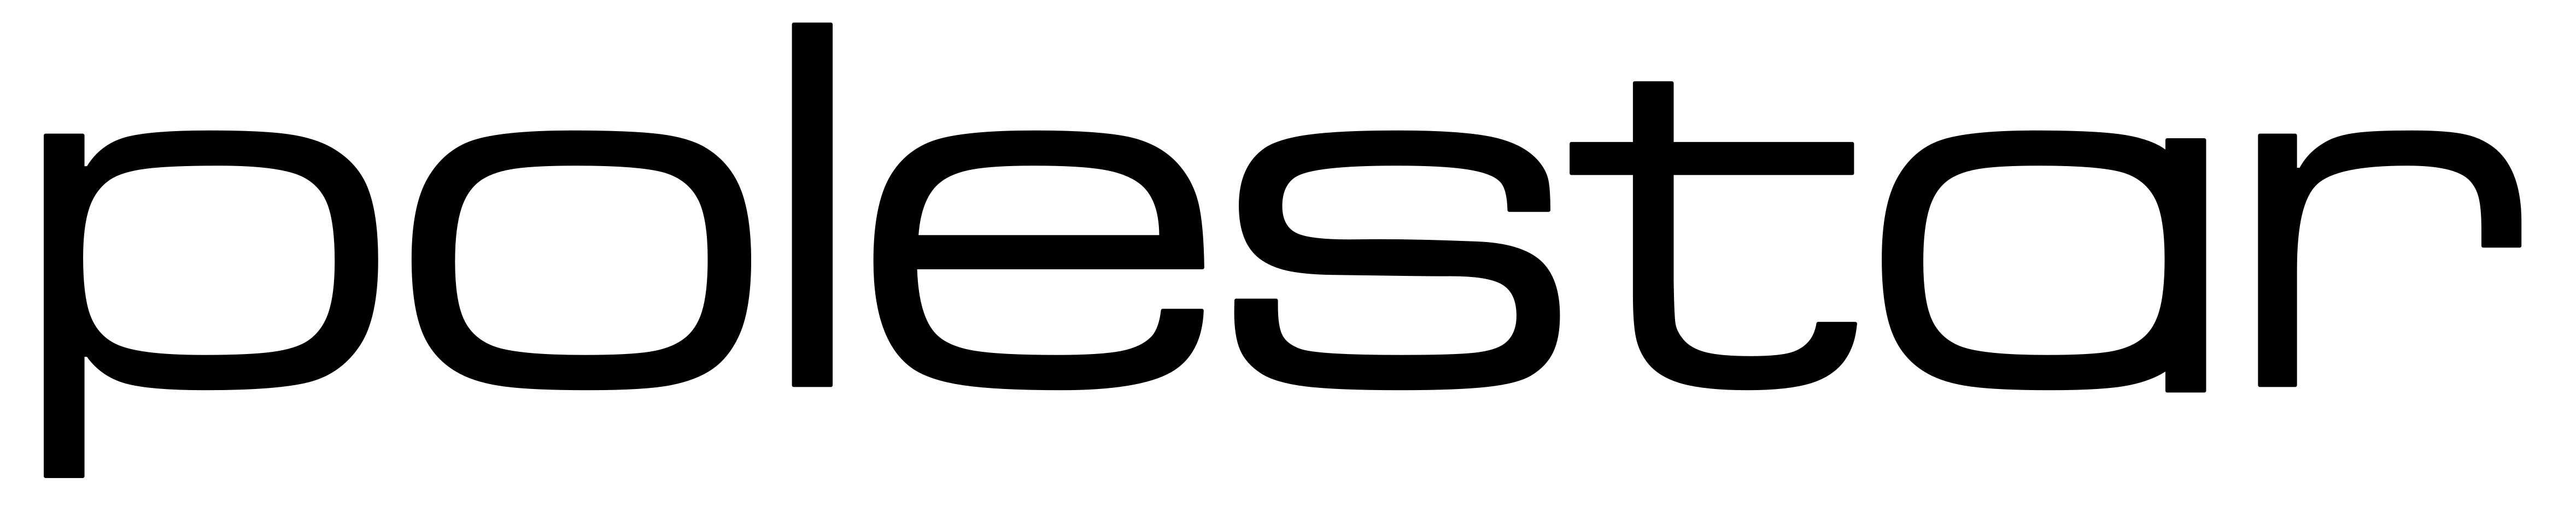 File:Polestar Logo.png - Wikimedia Commons